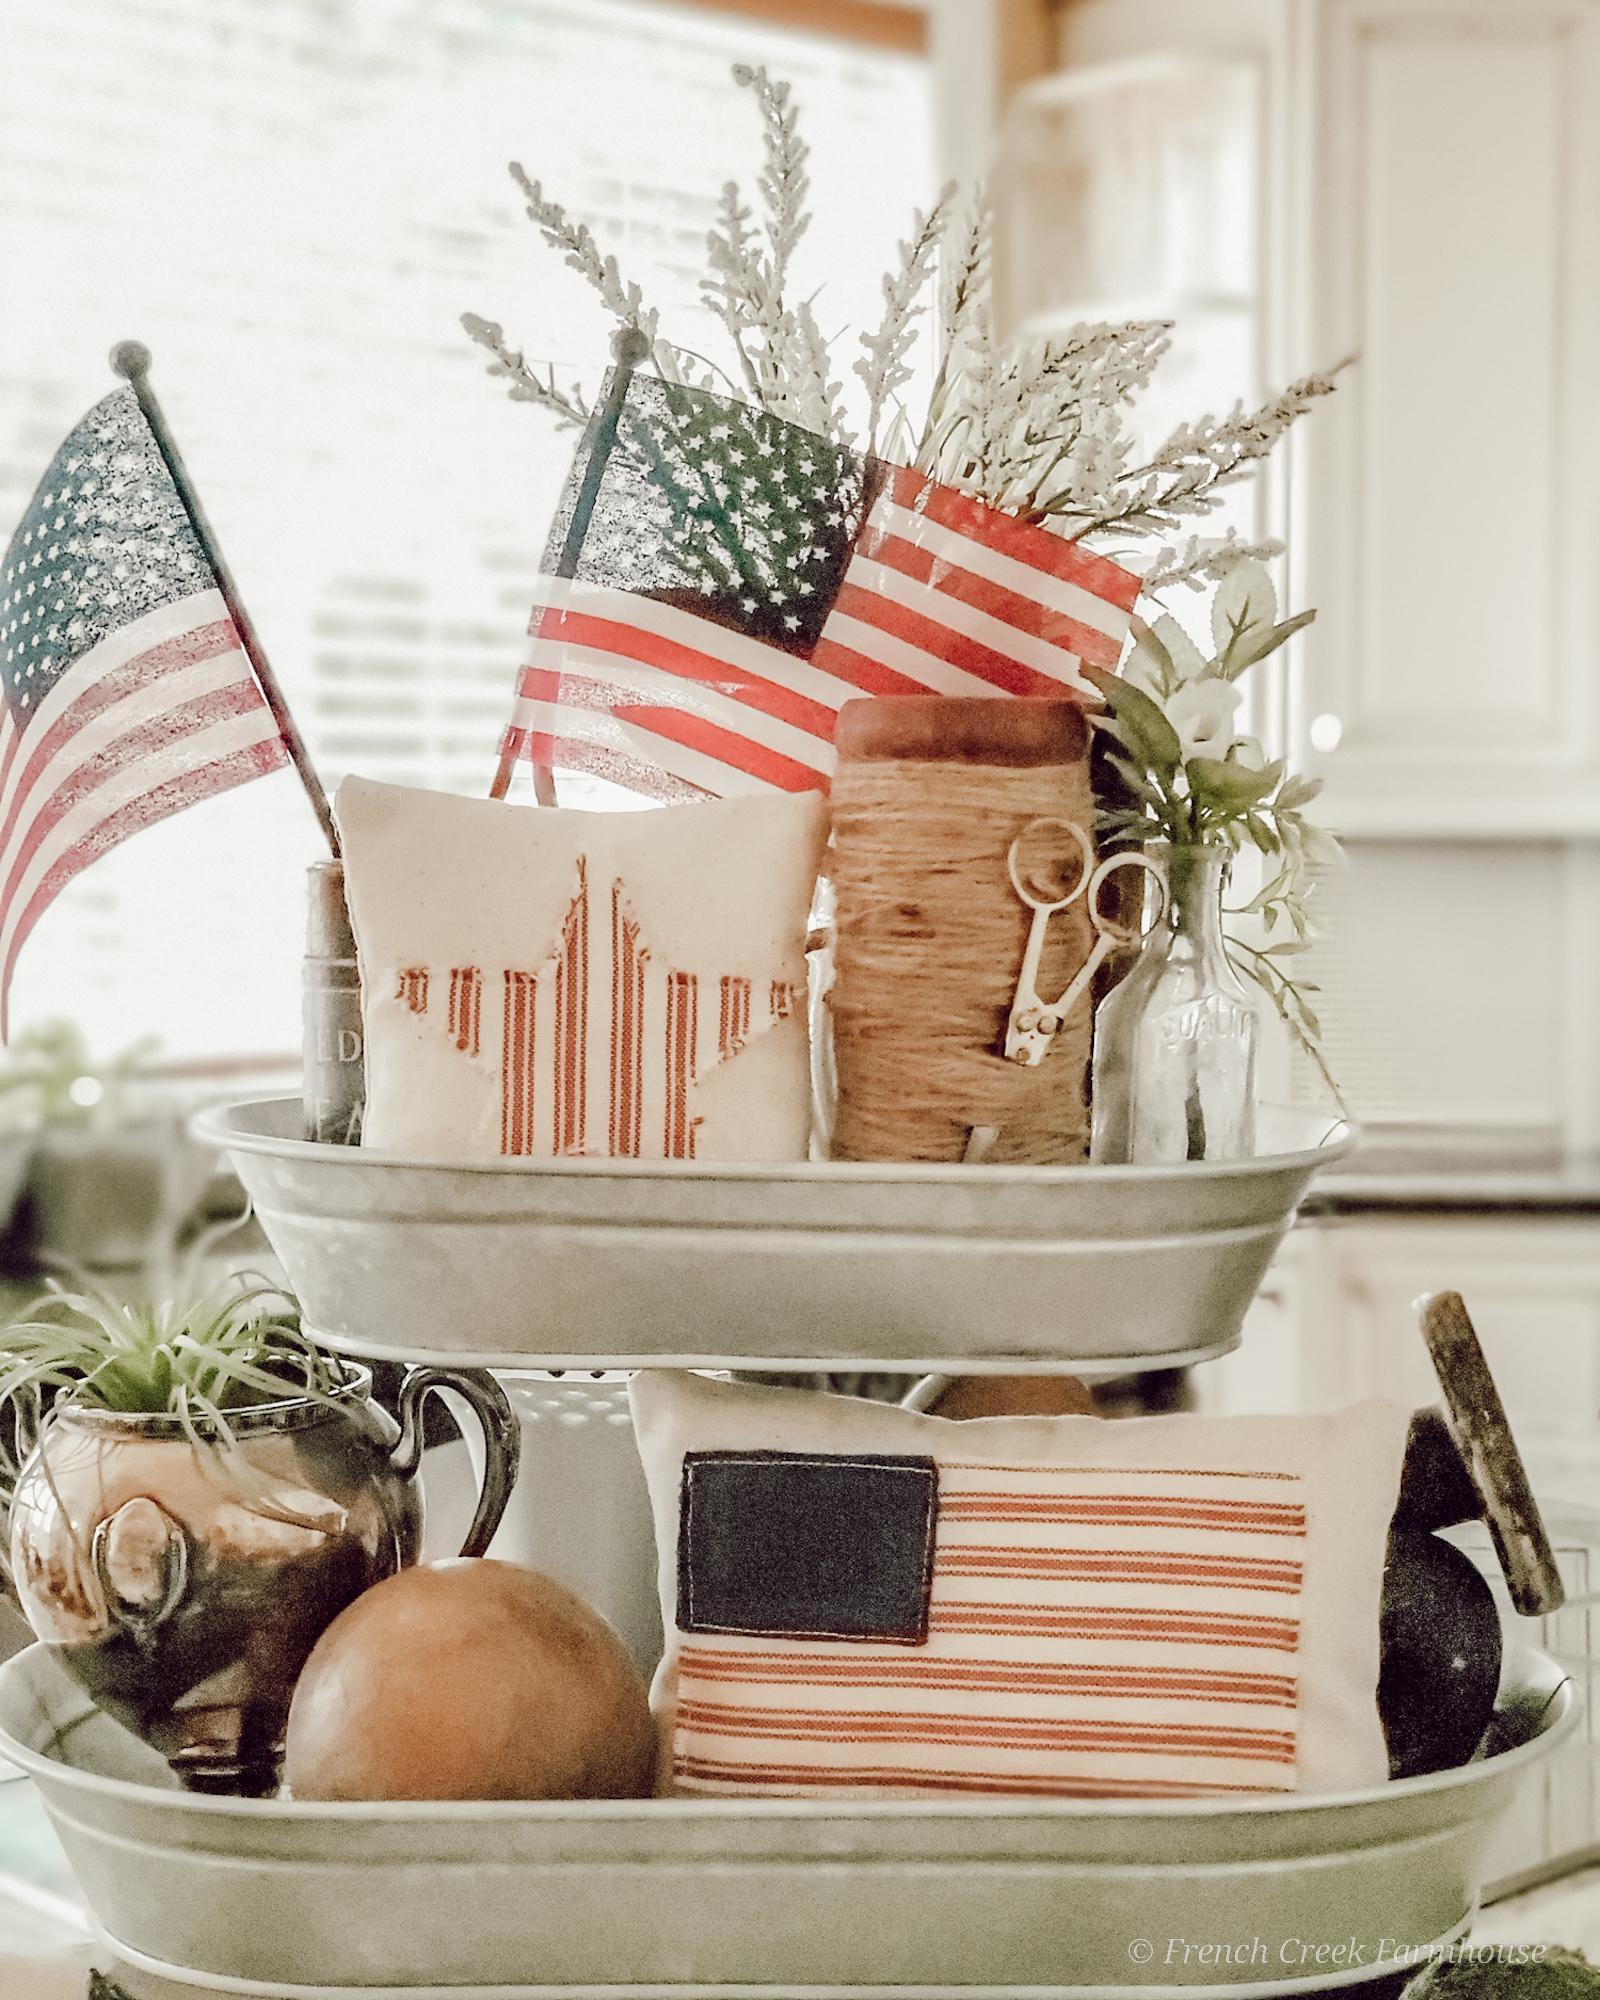 Patriotic vintage decor and American flags